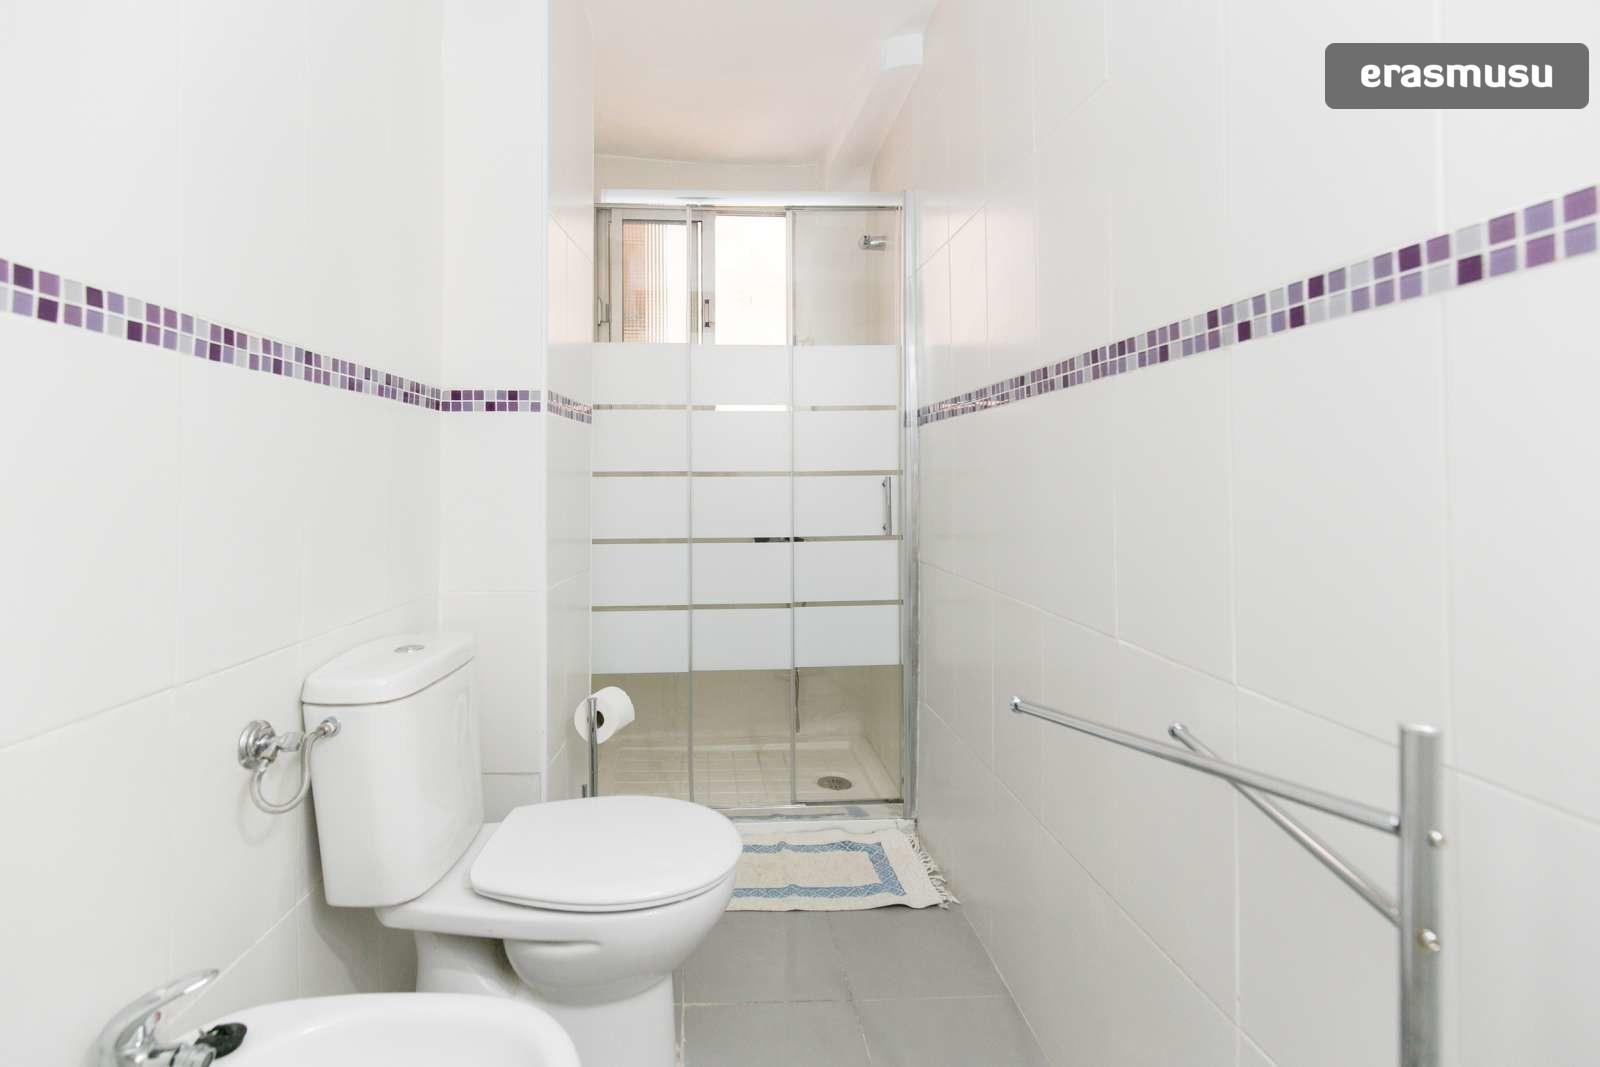 spacious-3-bedroom-apartment-rent-realejo-c7424bbeb1d18e44683a0e